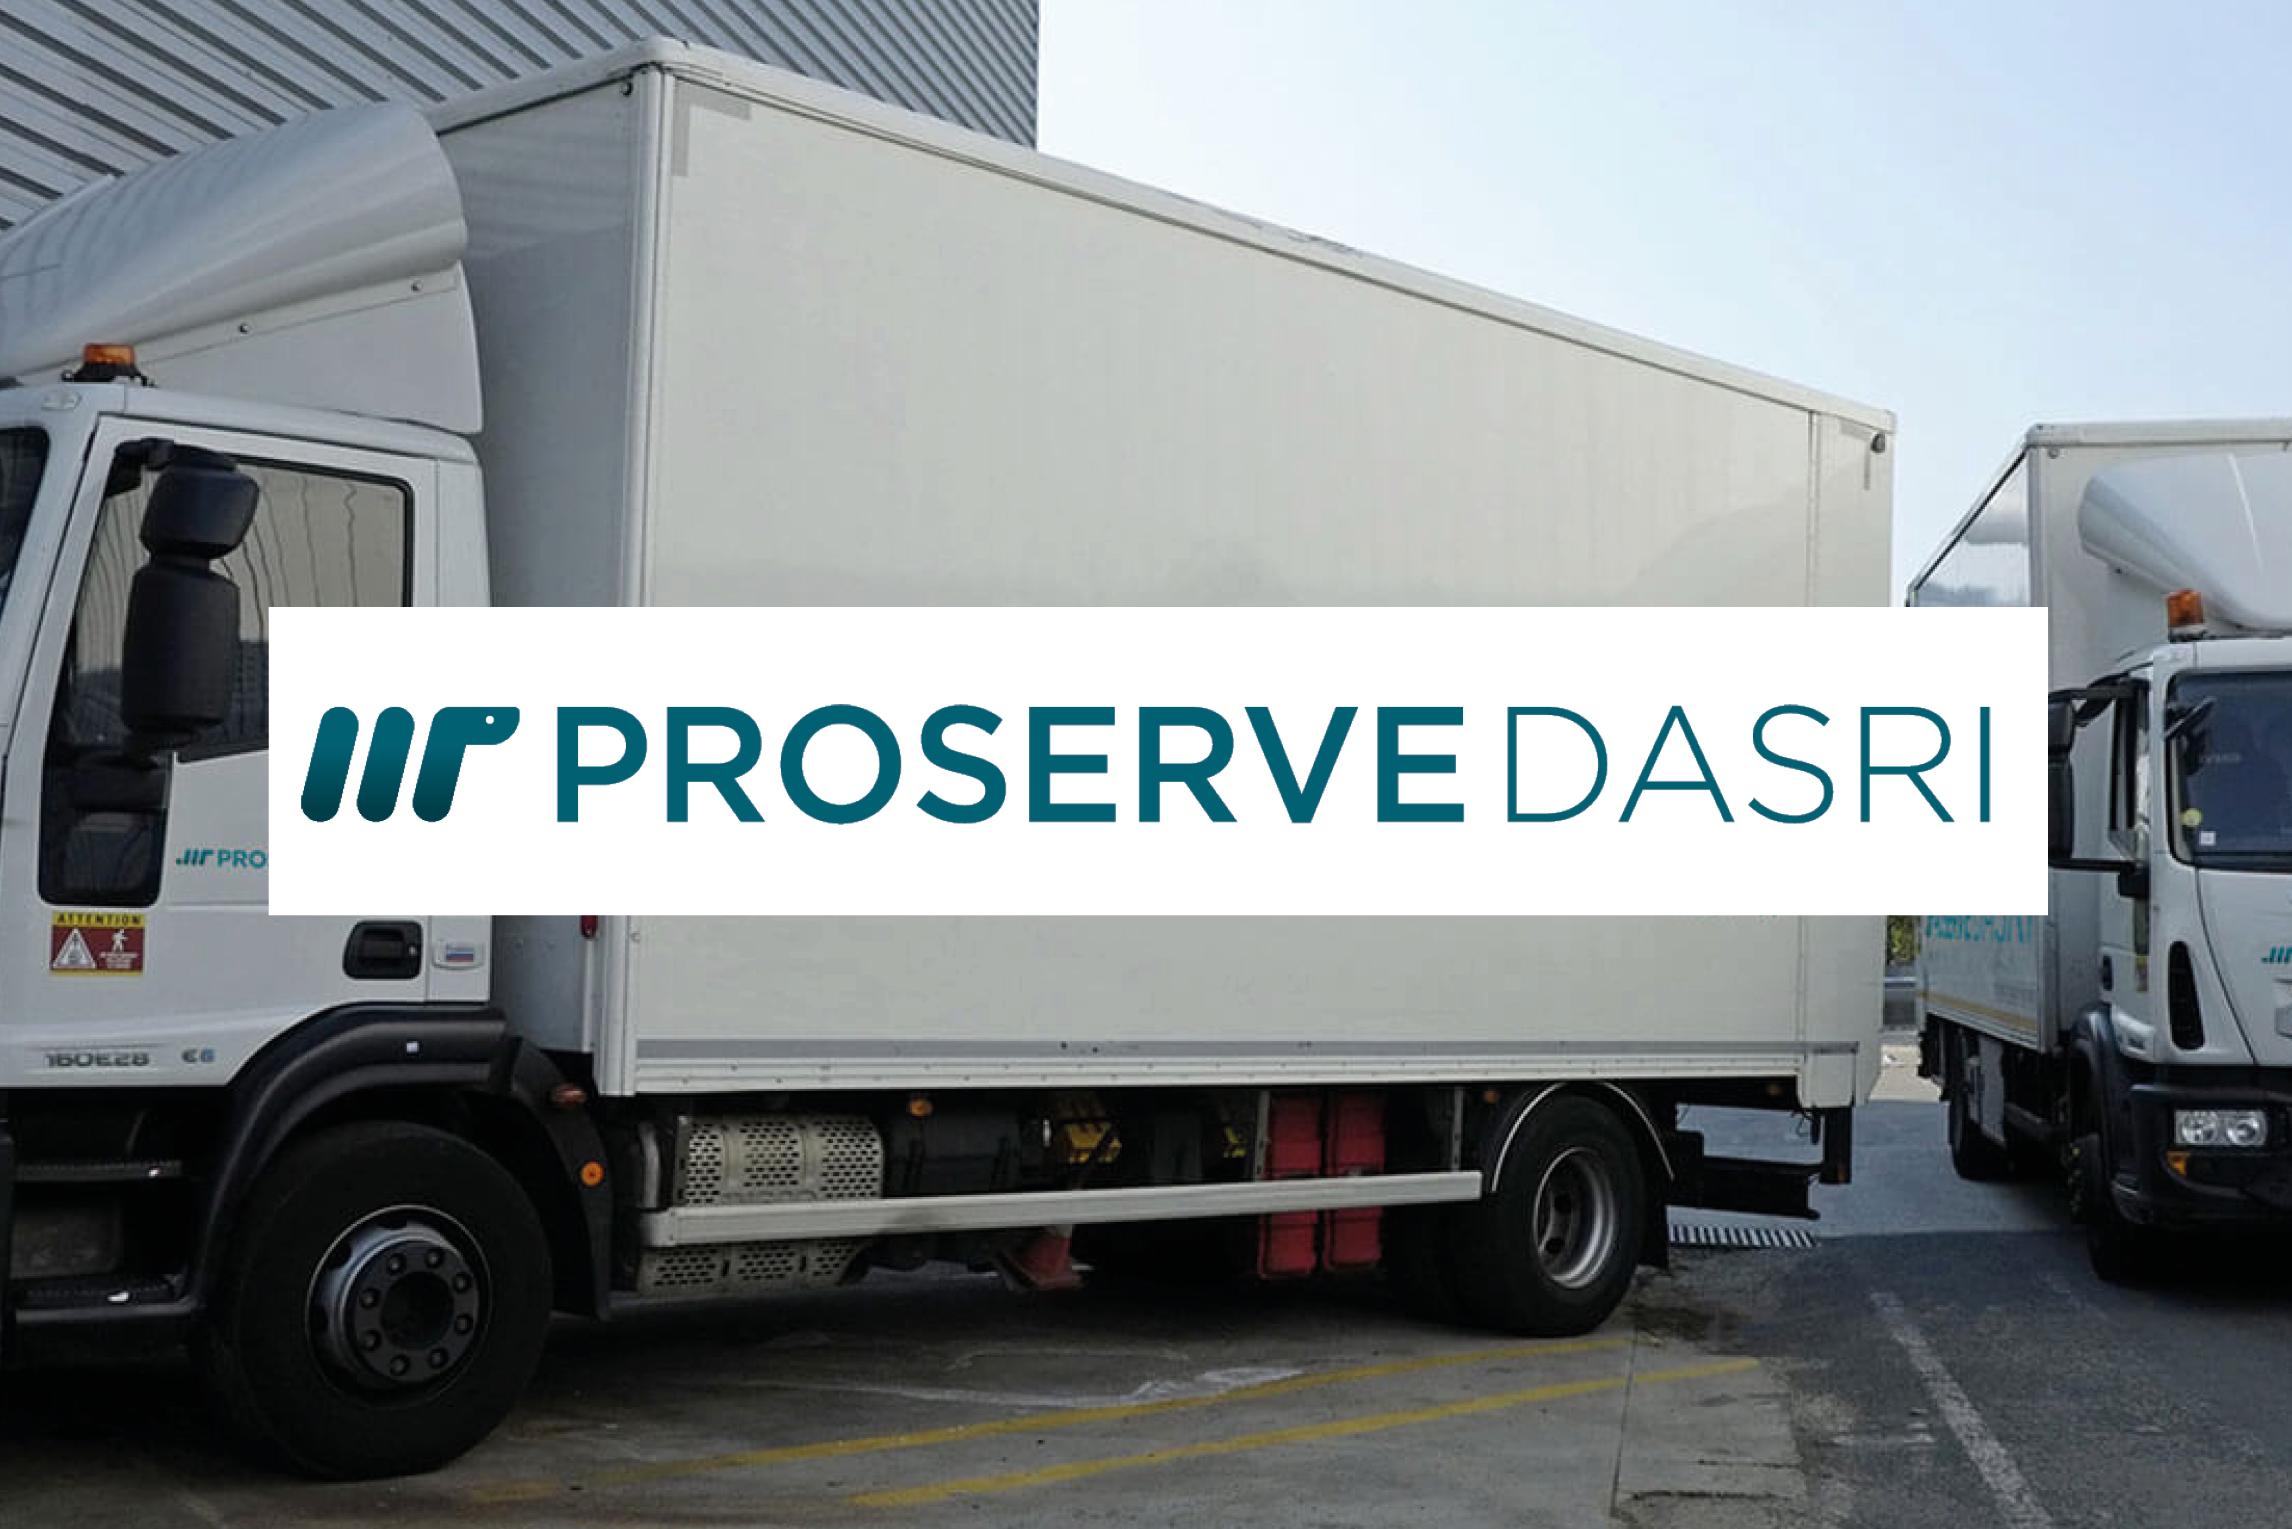 Proserve Dasri a choisi la solution Opti Time TourSolver